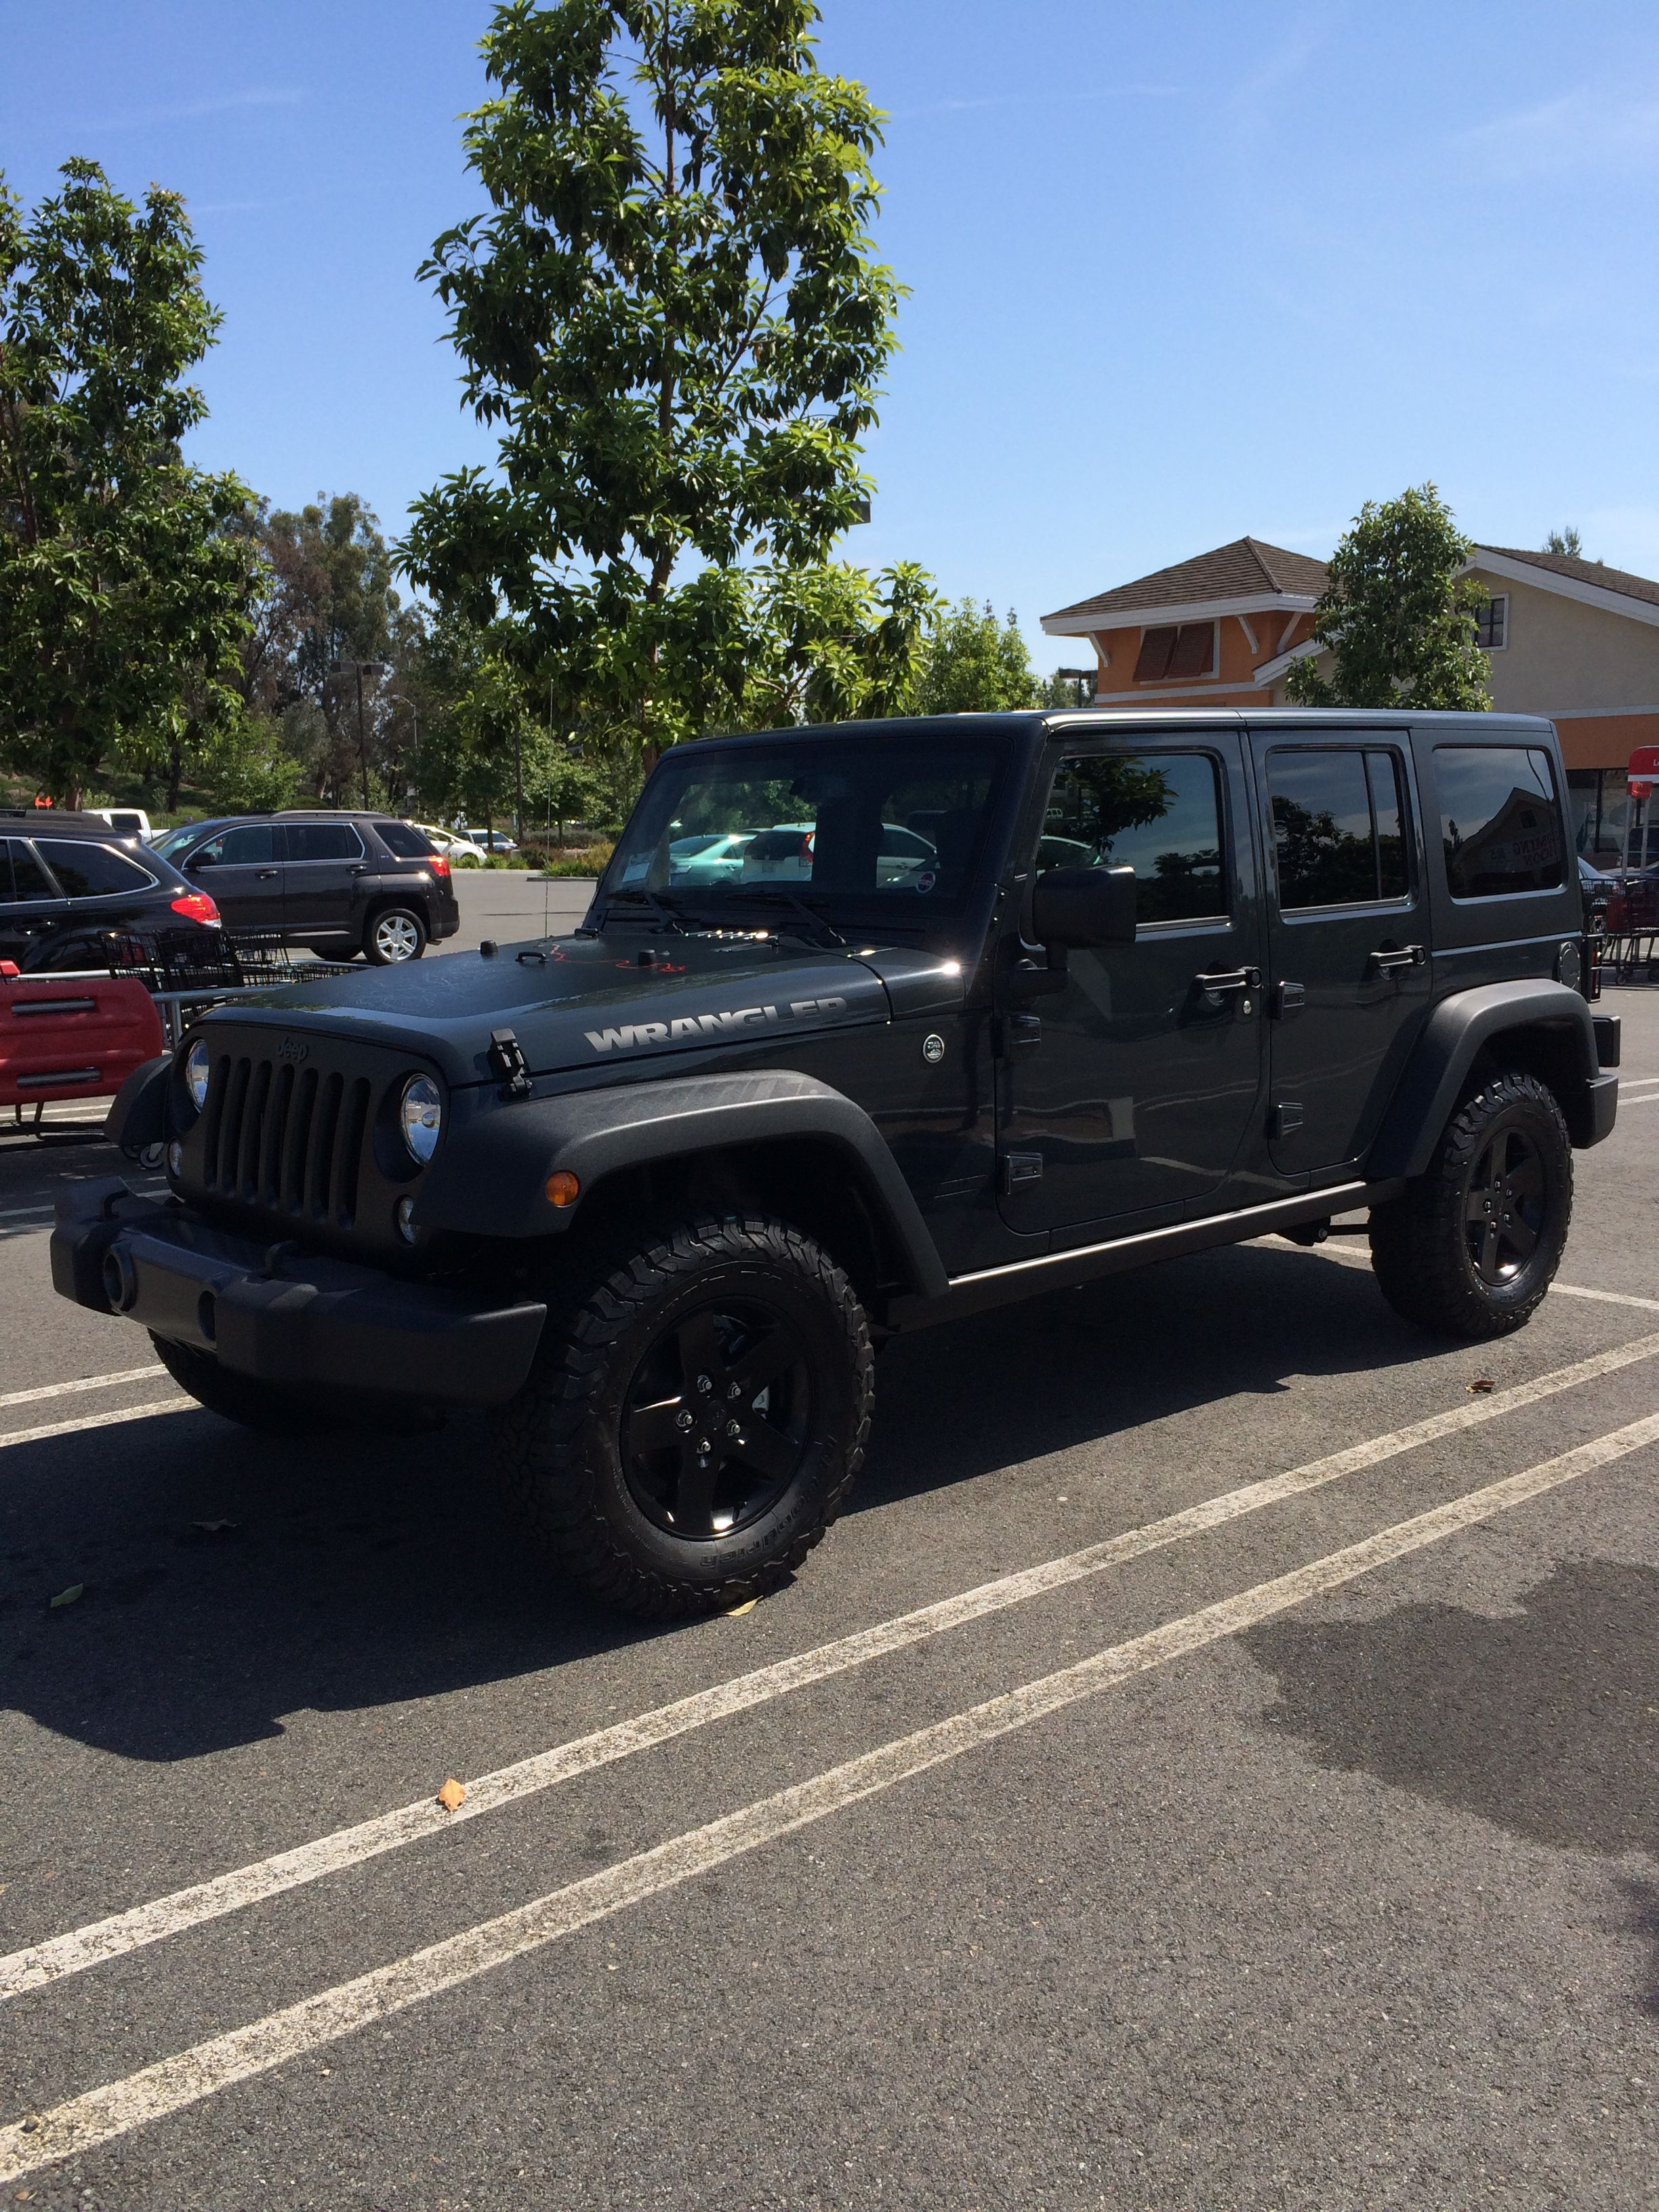 Jeep Big Bear >> My 2017 Jeep Wrangler Big Bear Limited Edition Color Rhino